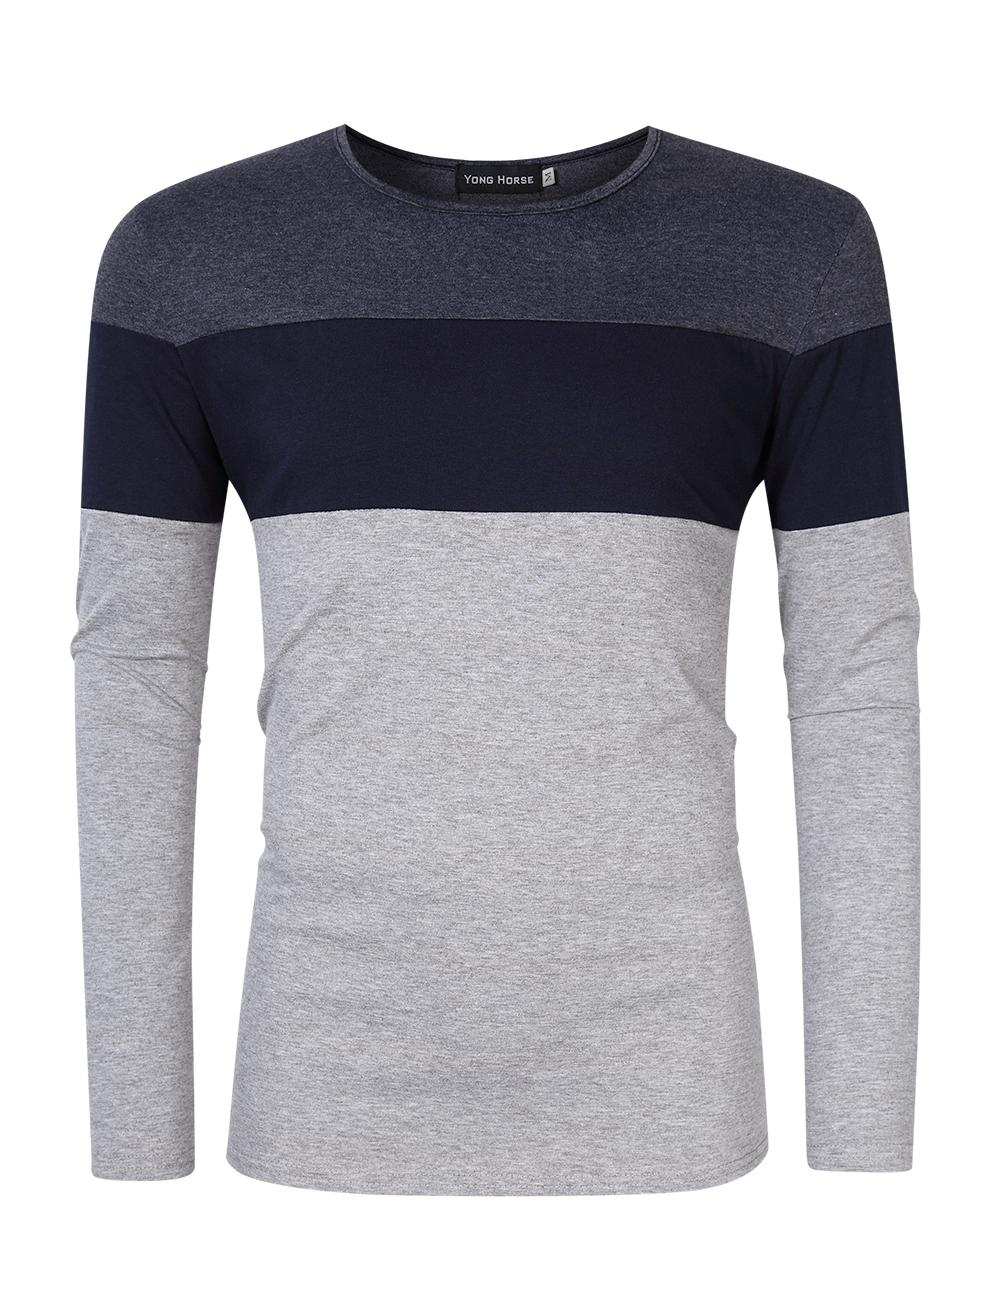 [US Direct] Yong Horse Men's Color Block Slim Fit Crew Neck Long Sleeve Basic Cotton T-Shirt Dark gray + sapphire blue_M